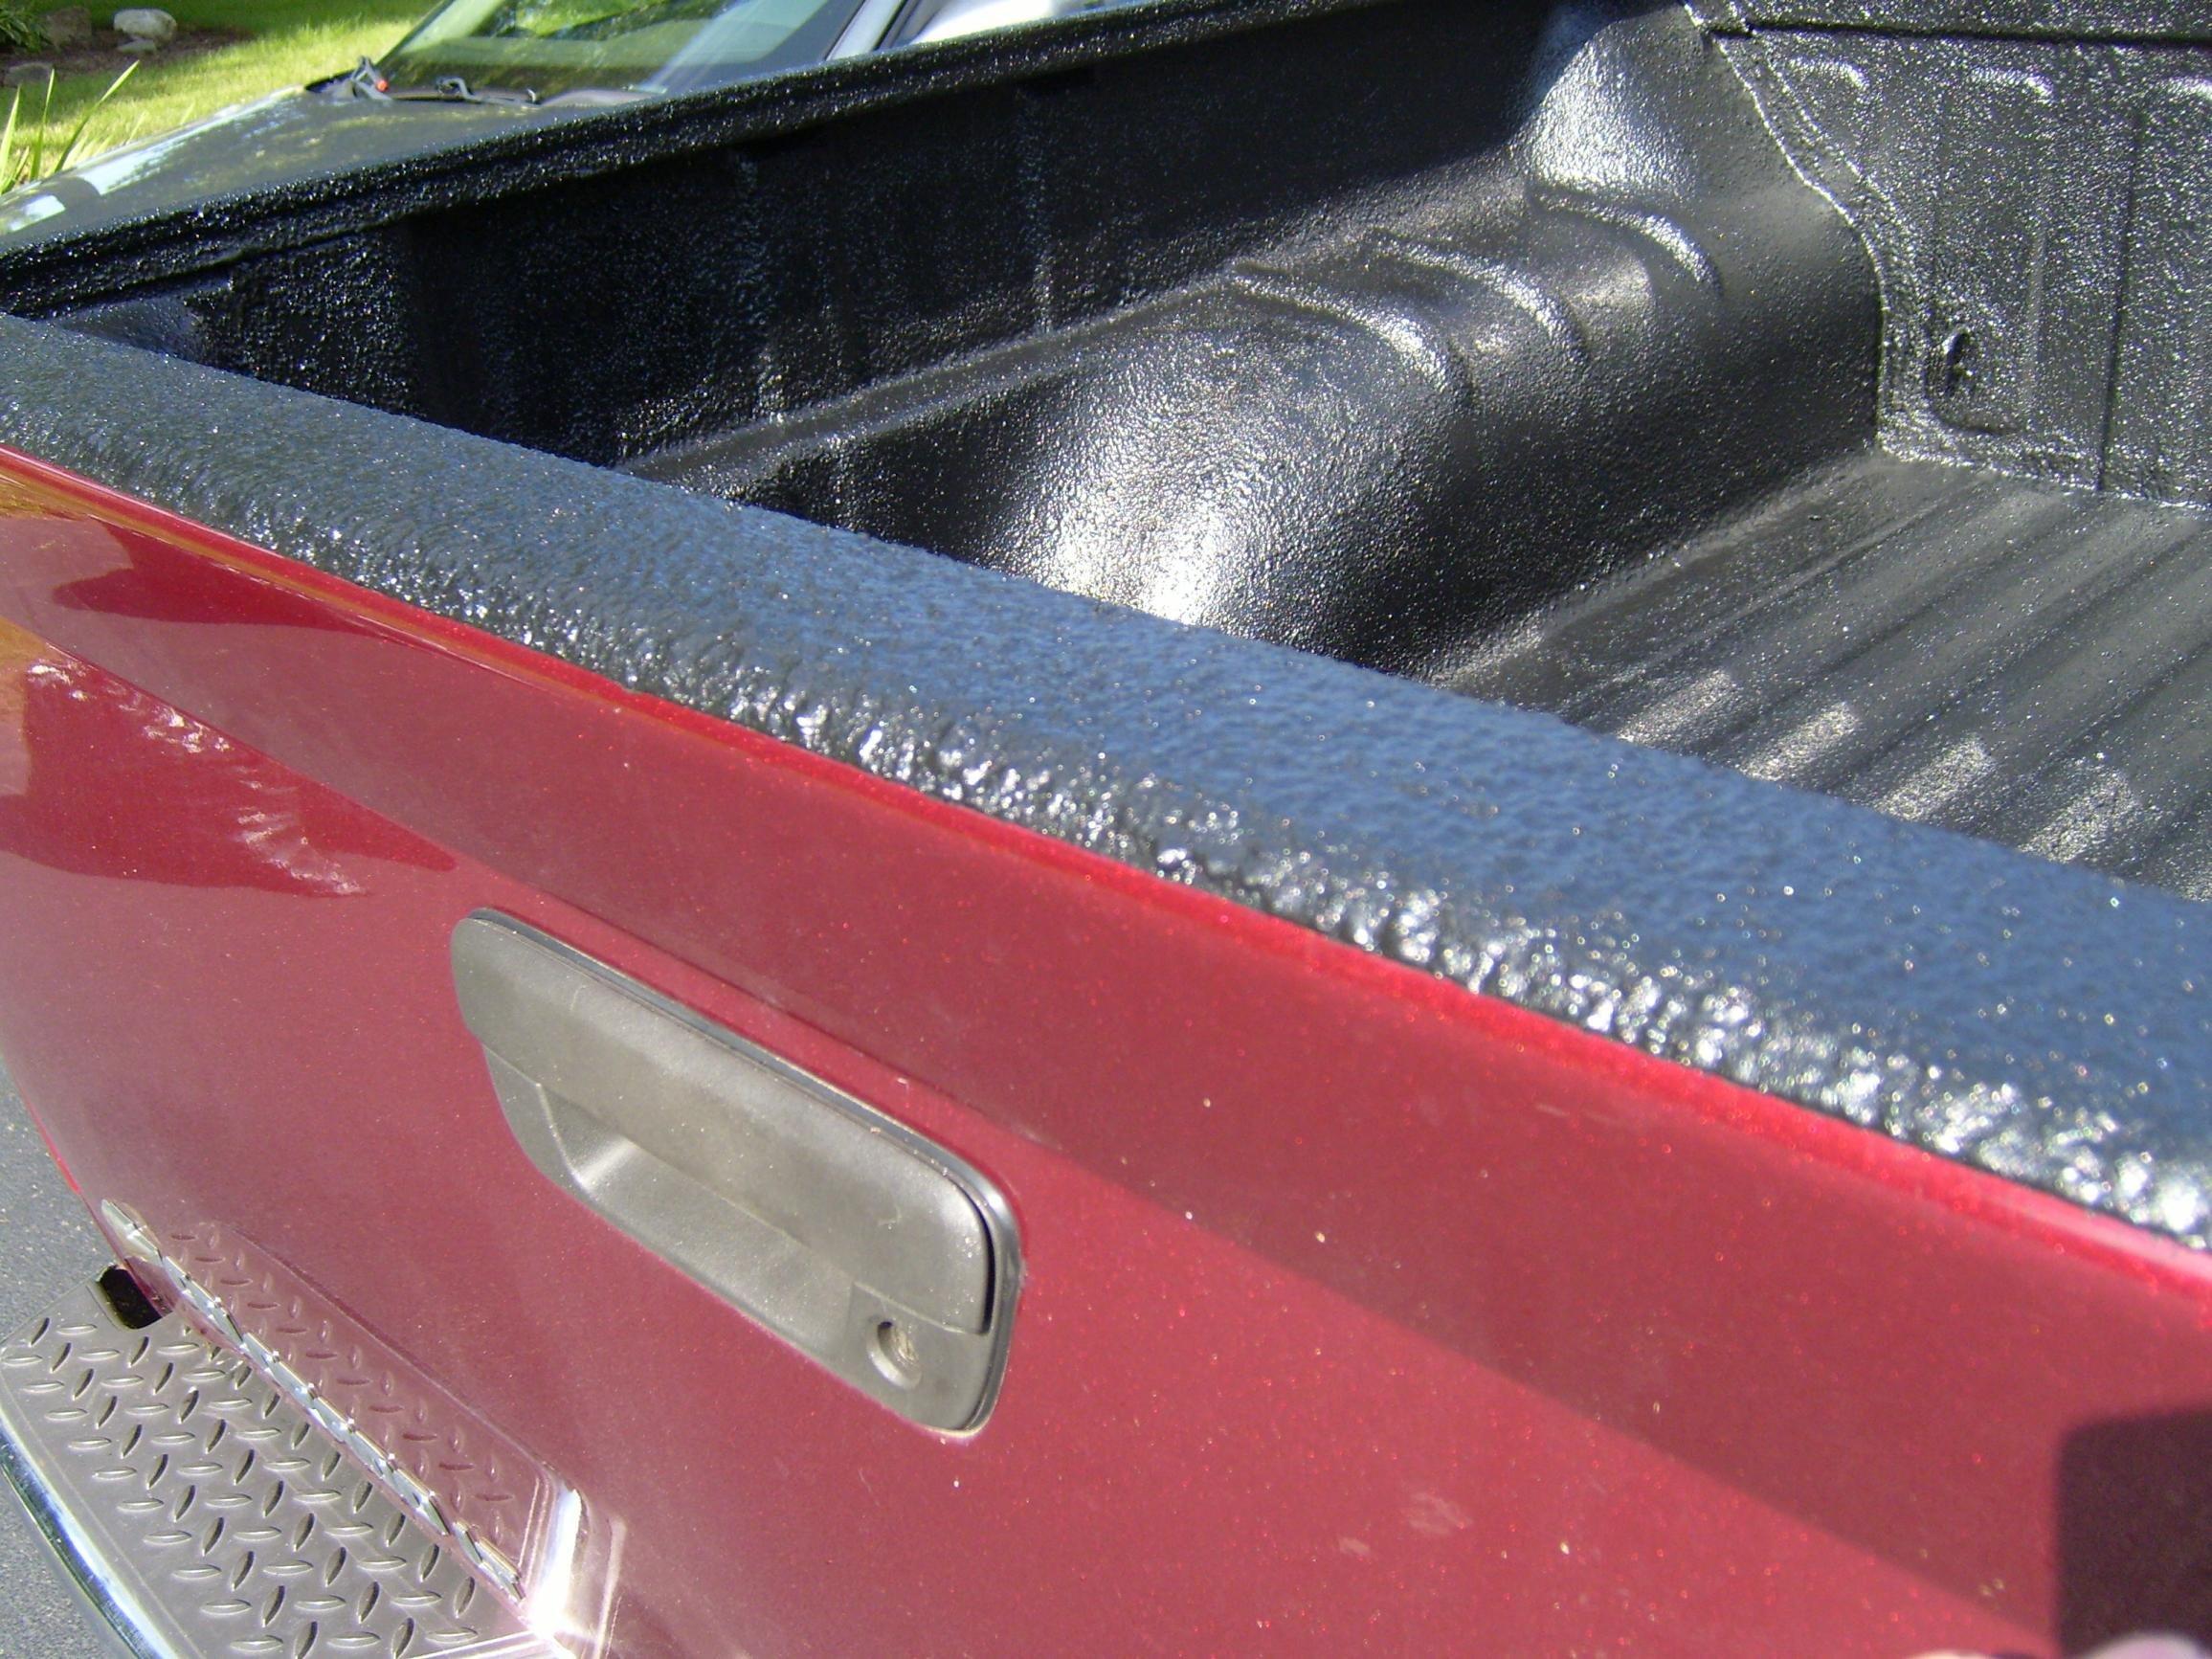 bed liner spray cans. rhino lining my interior truck floor